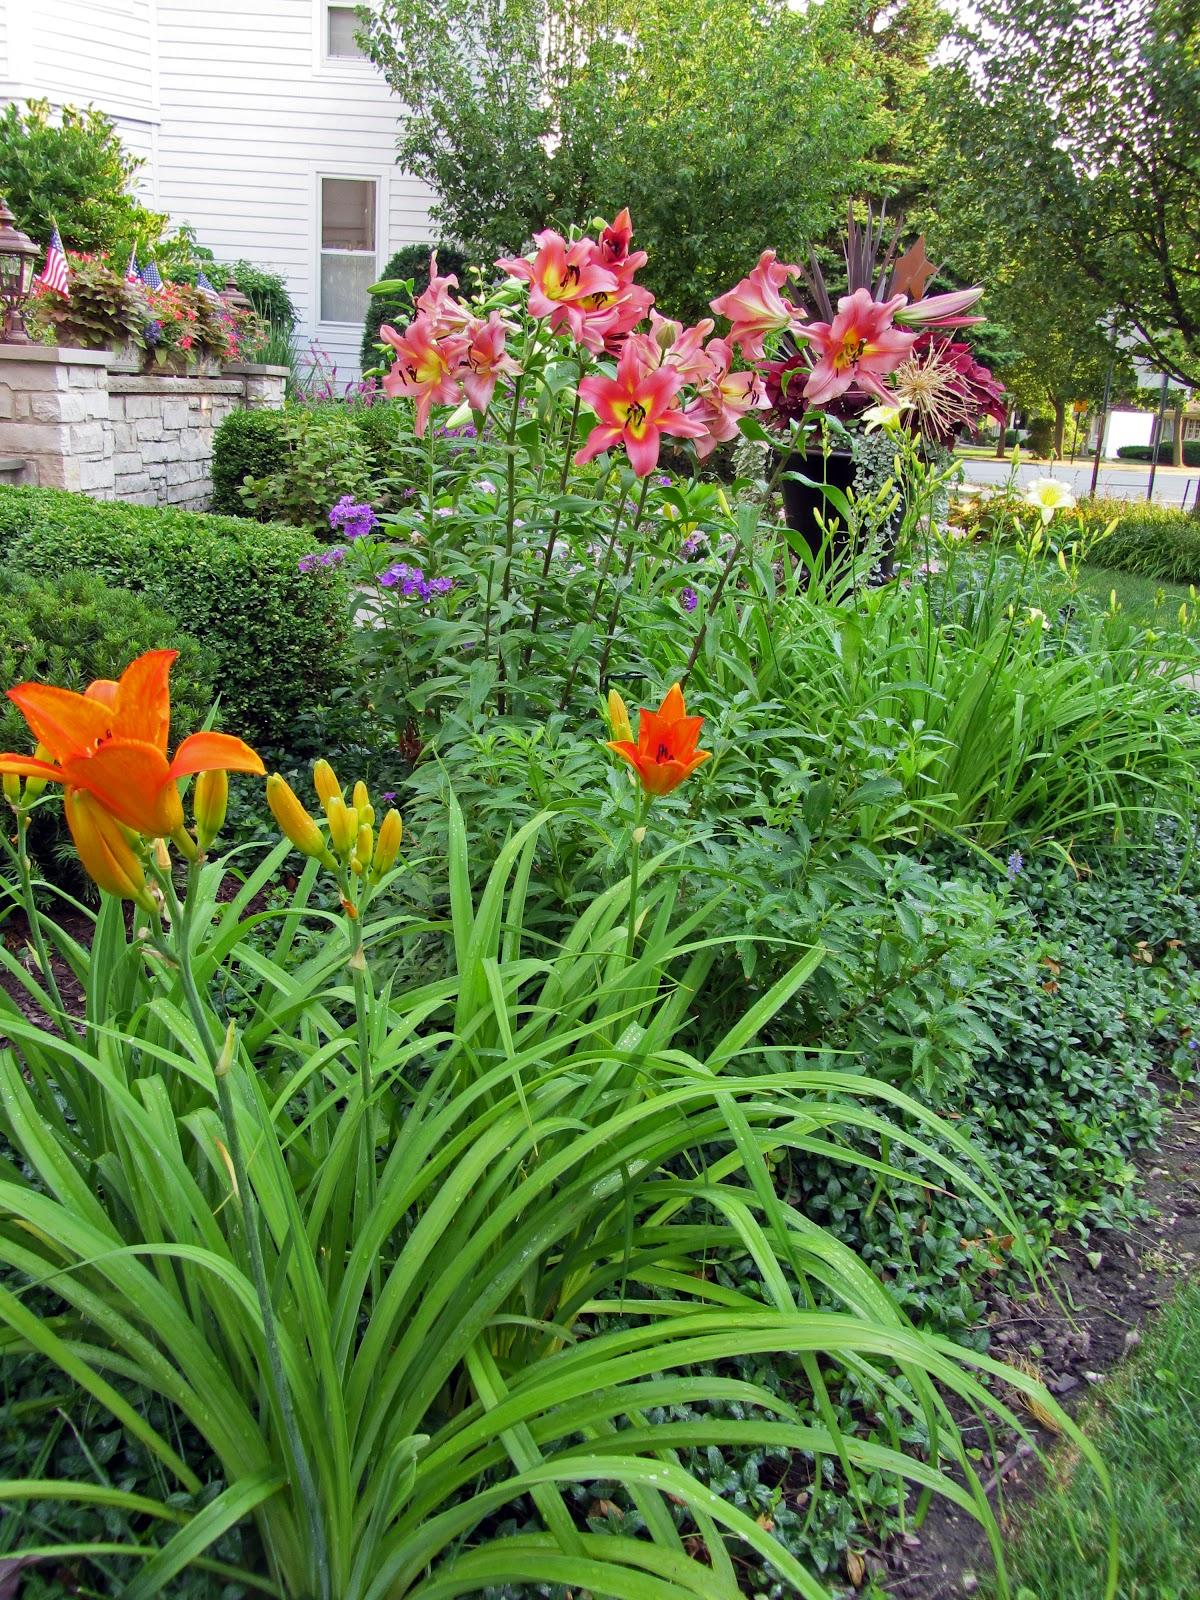 Gatsbys Gardens Jun 29 2012